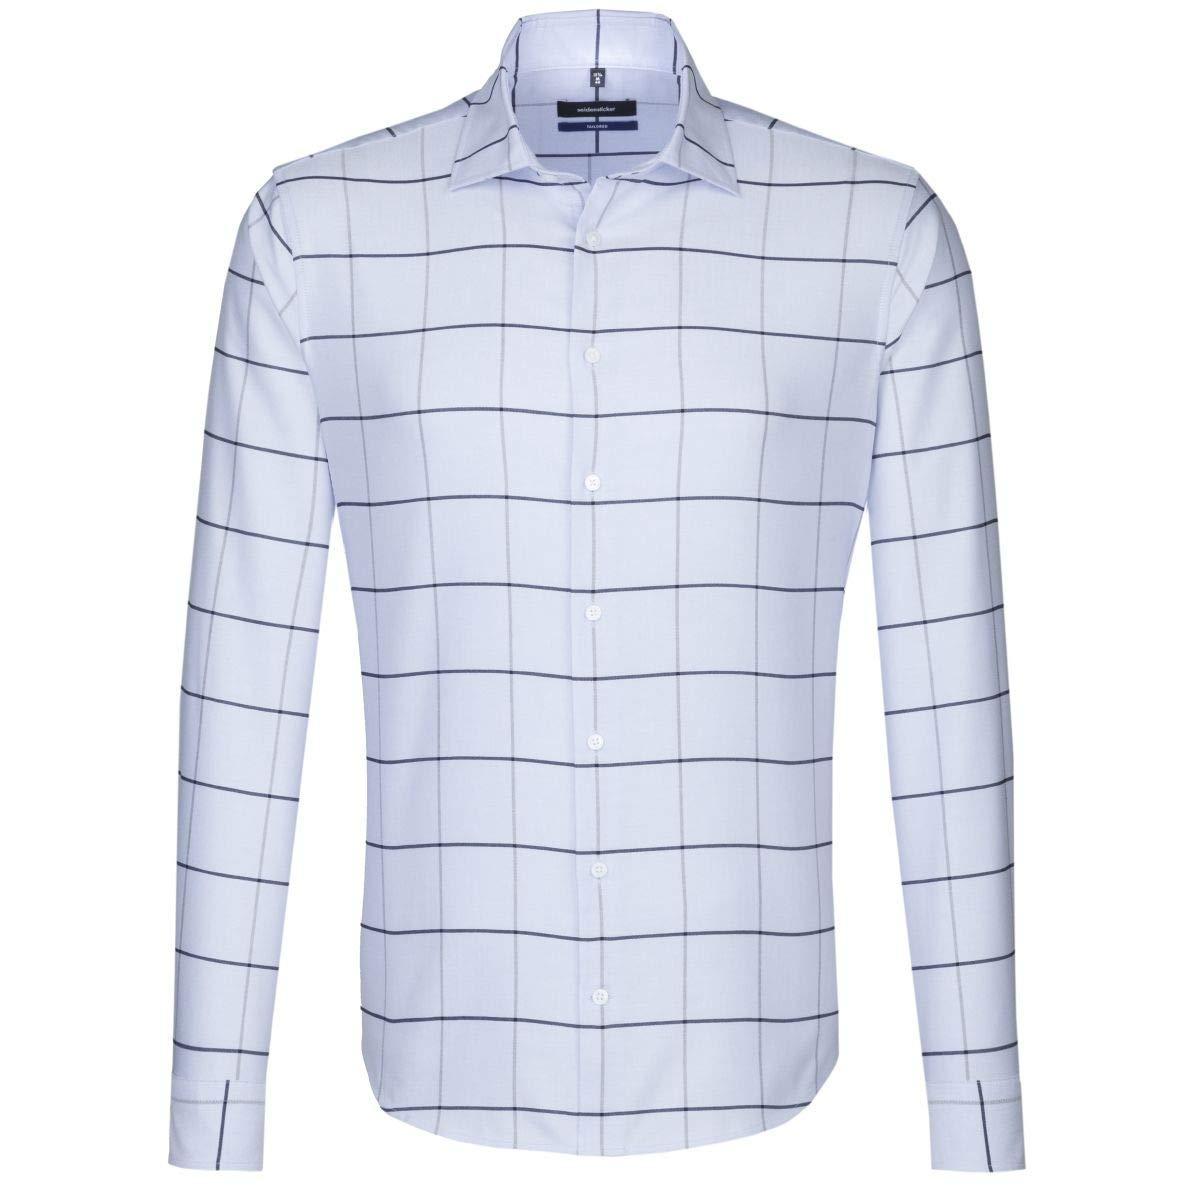 Seidensticker - Camisa Formal - Clásico - Manga Larga - para Hombre